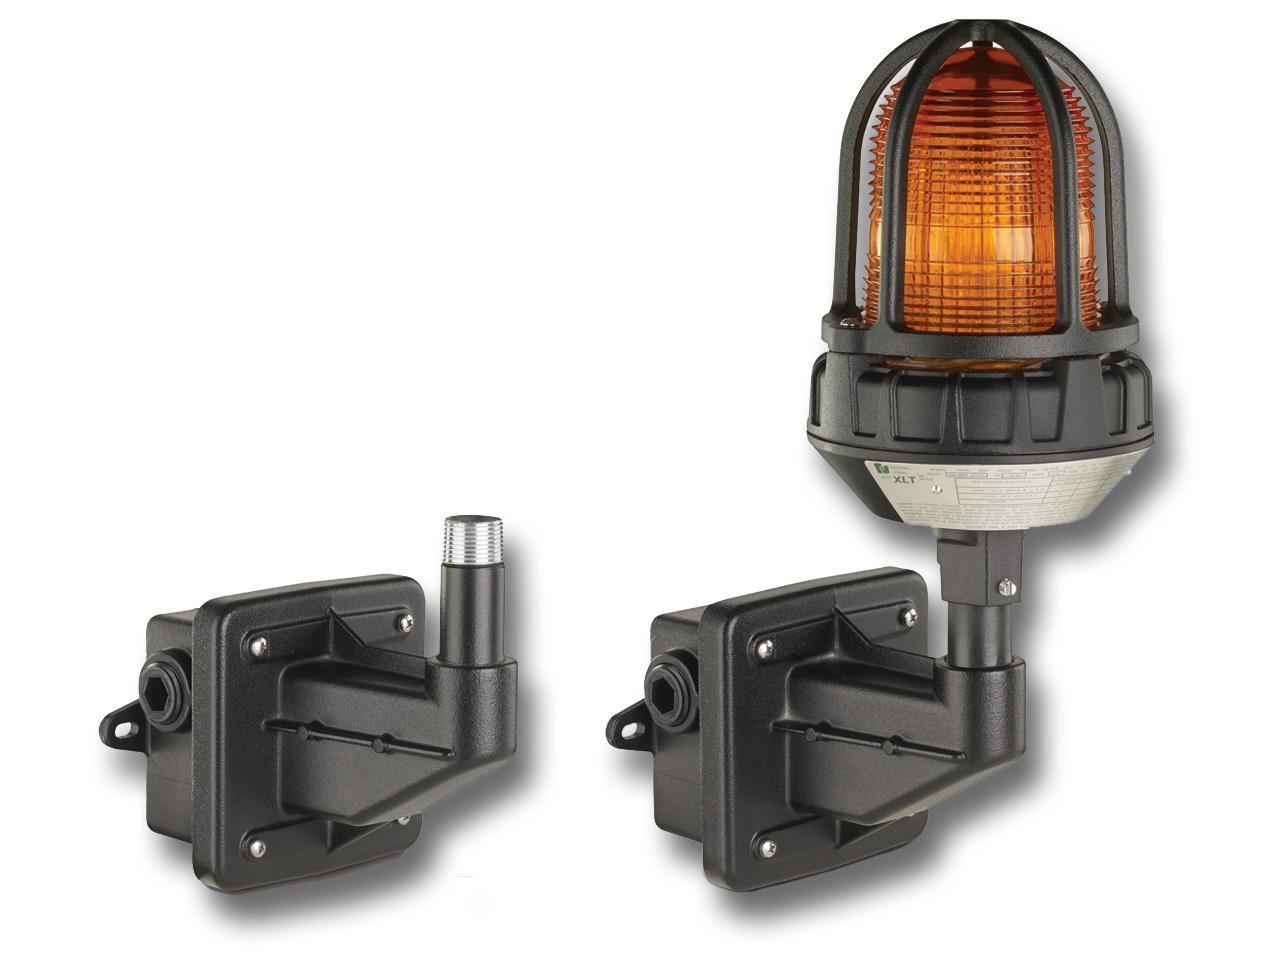 Visual Signals Signaling Platforms Led Beacons Strobe And Watt Power Inverter 12v Dc To 230v Ac Electronic Circuits Diagram Lhwb Hazardous Location Light Mounting Kit